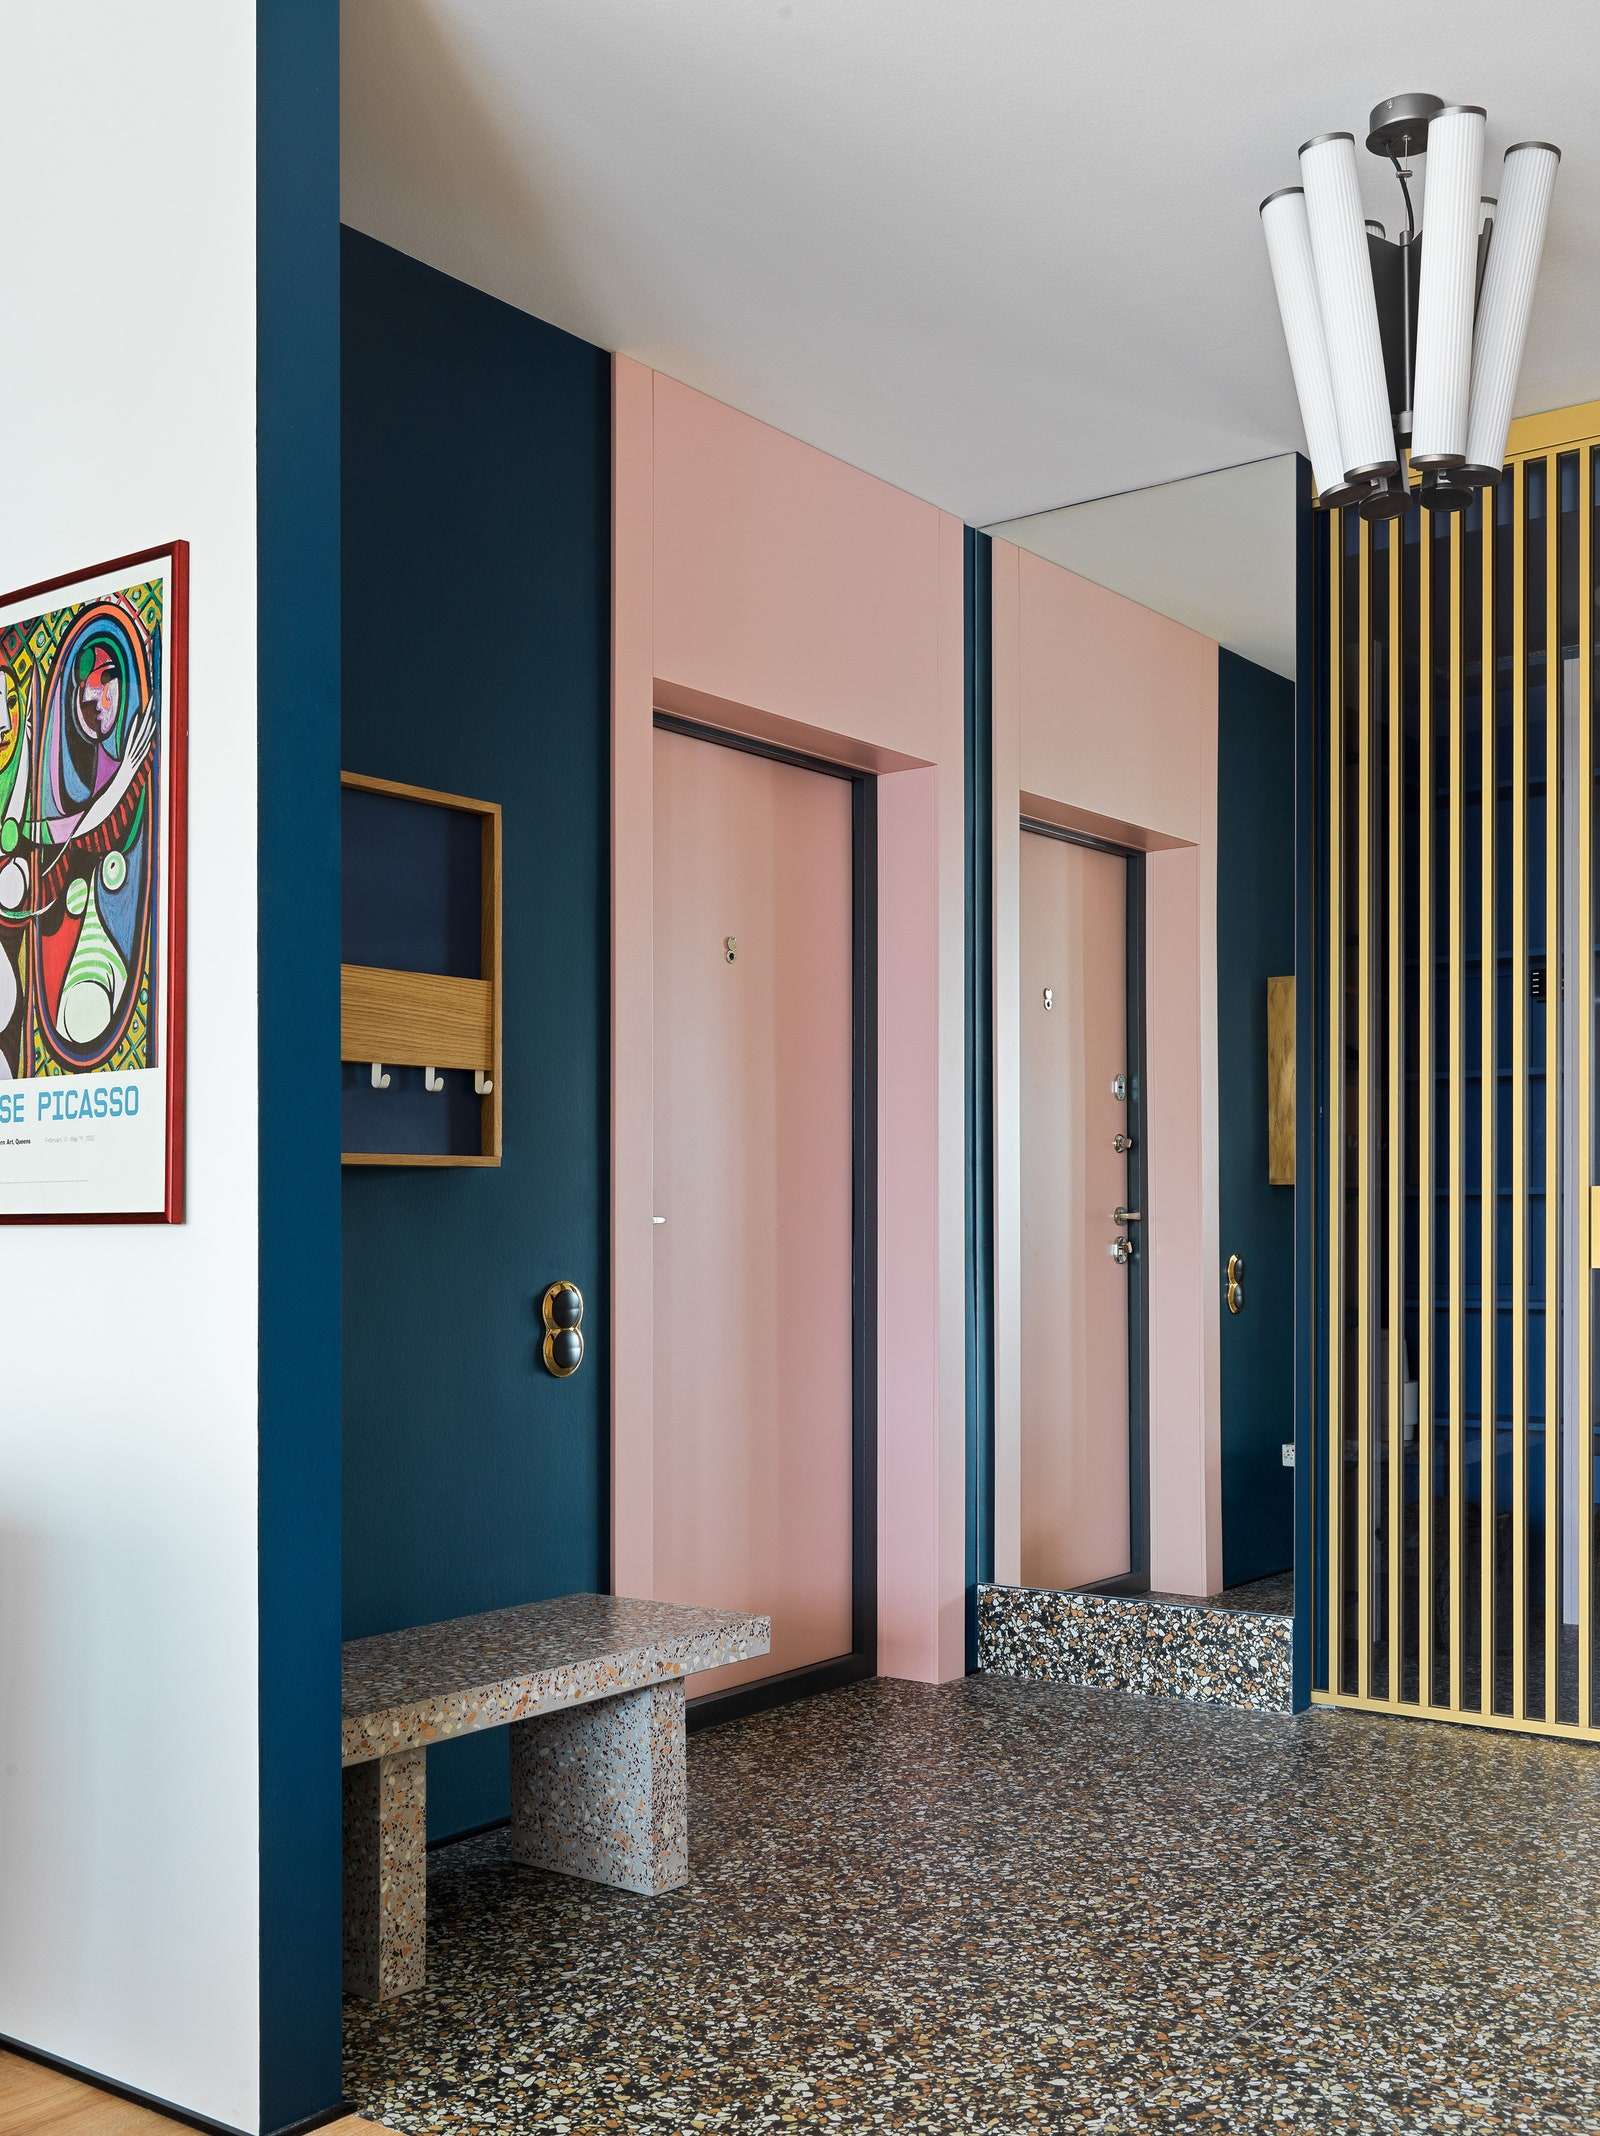 200 . .        Petrobeton   Miksal   Norr 11    New Design Porte  Simon Electric   Matisse Picasso  Florim.